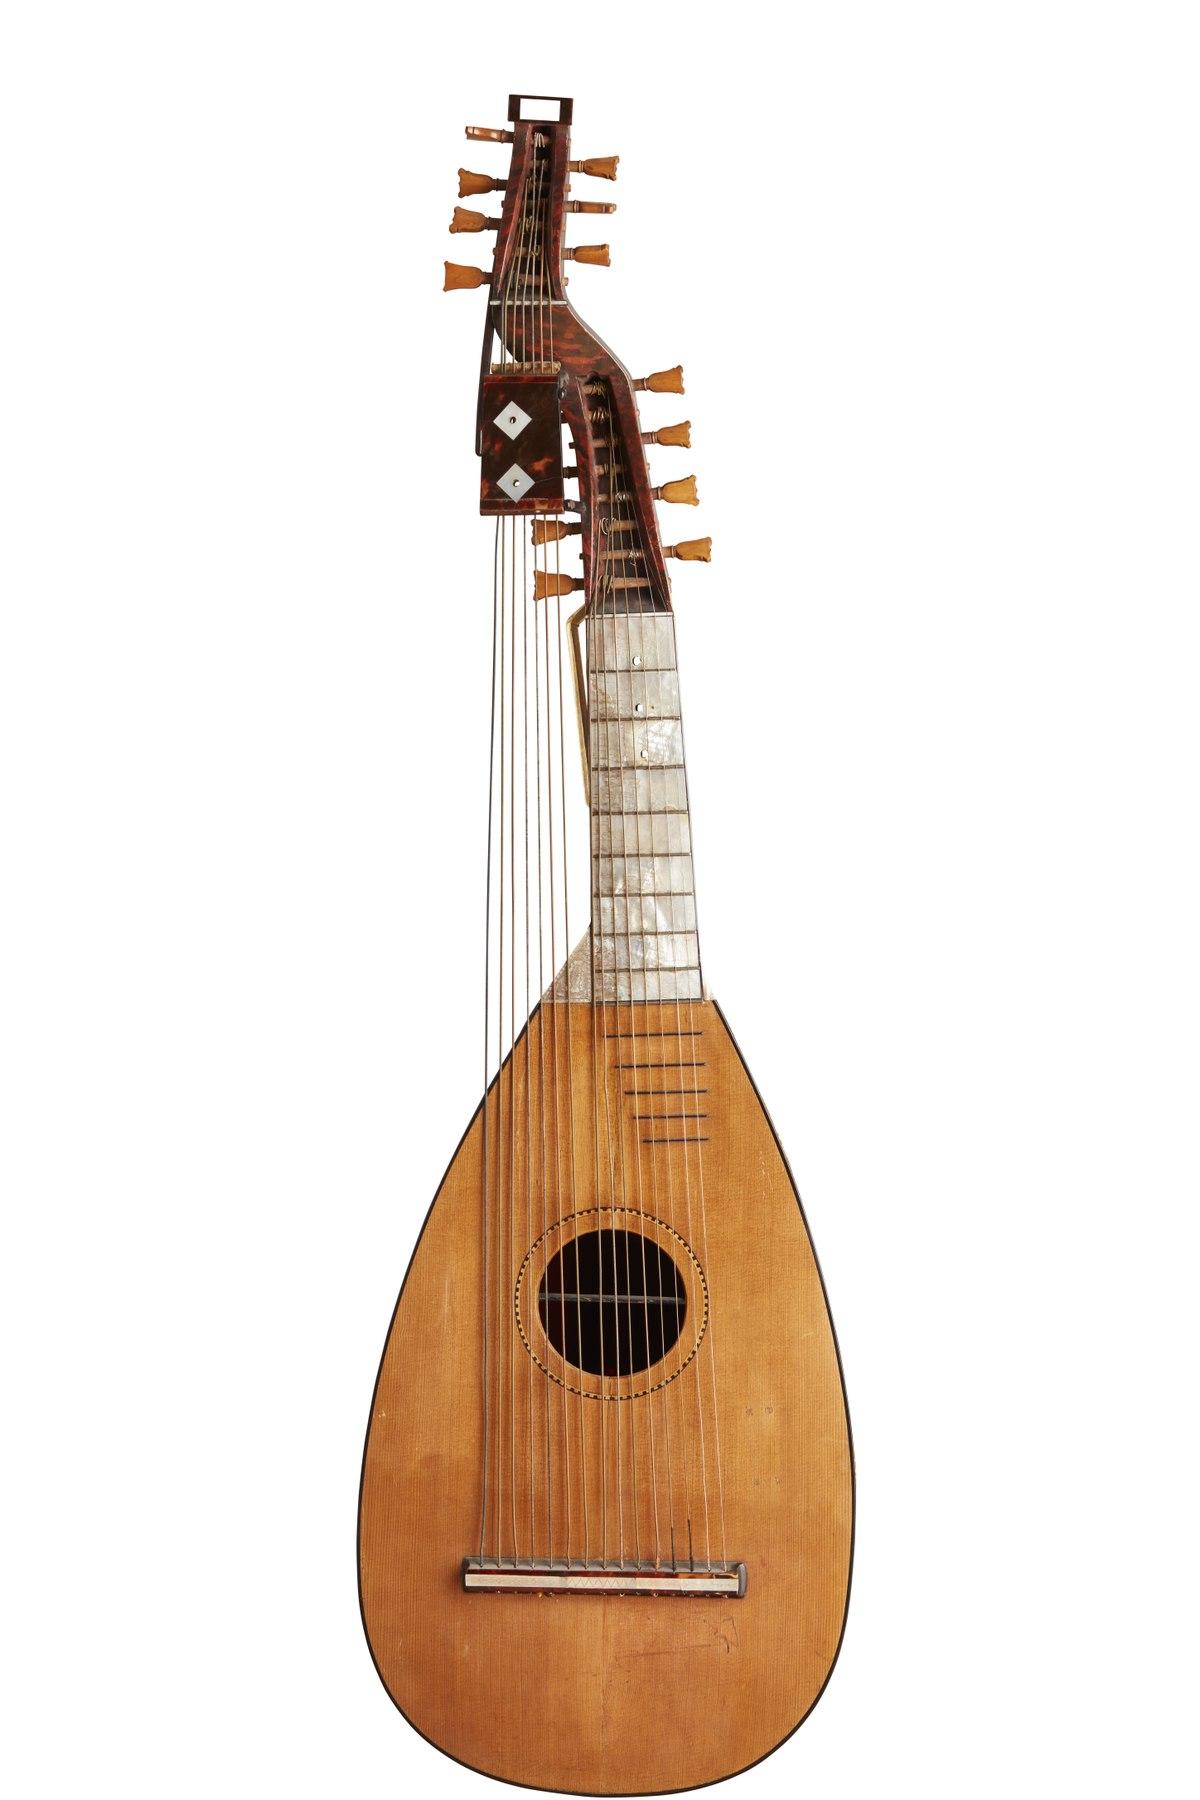 Angelique Instrument Wikipedia